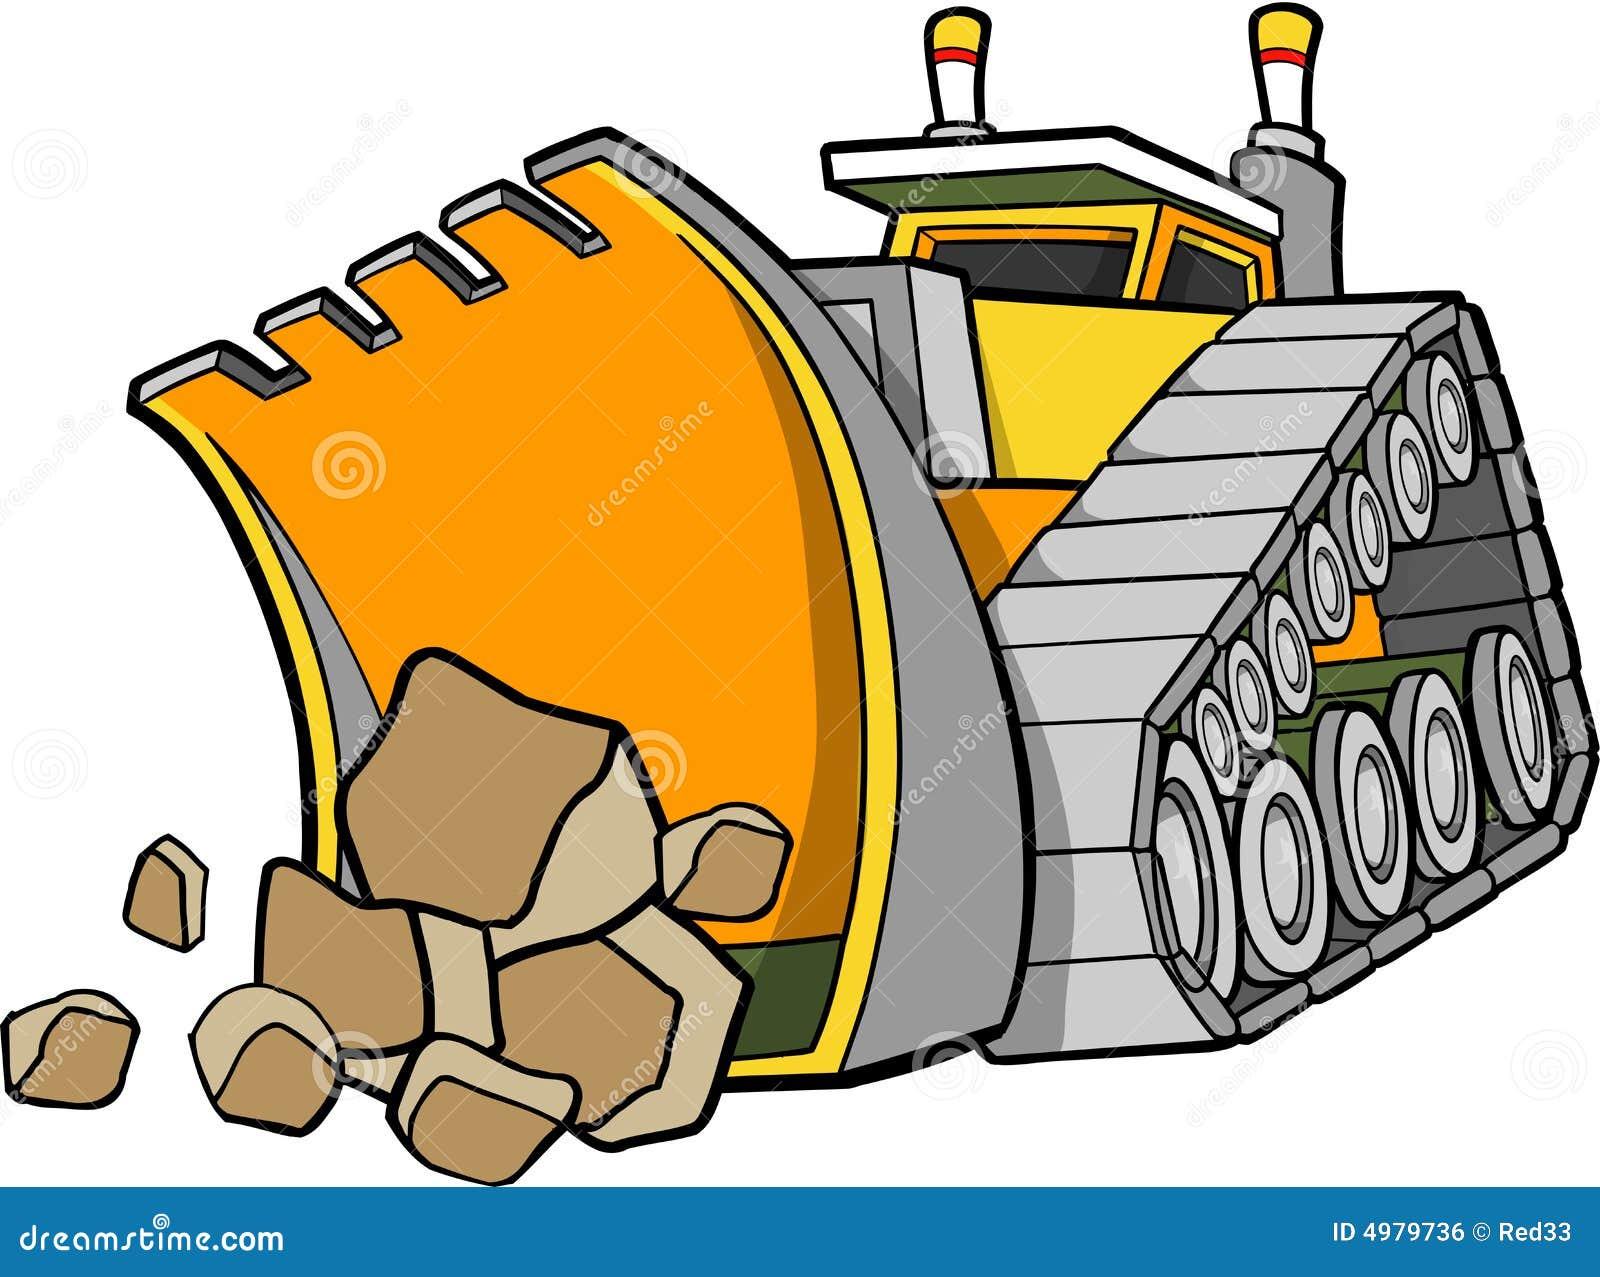 Bulldozer Vector Illustration Royalty Free Stock Image ...